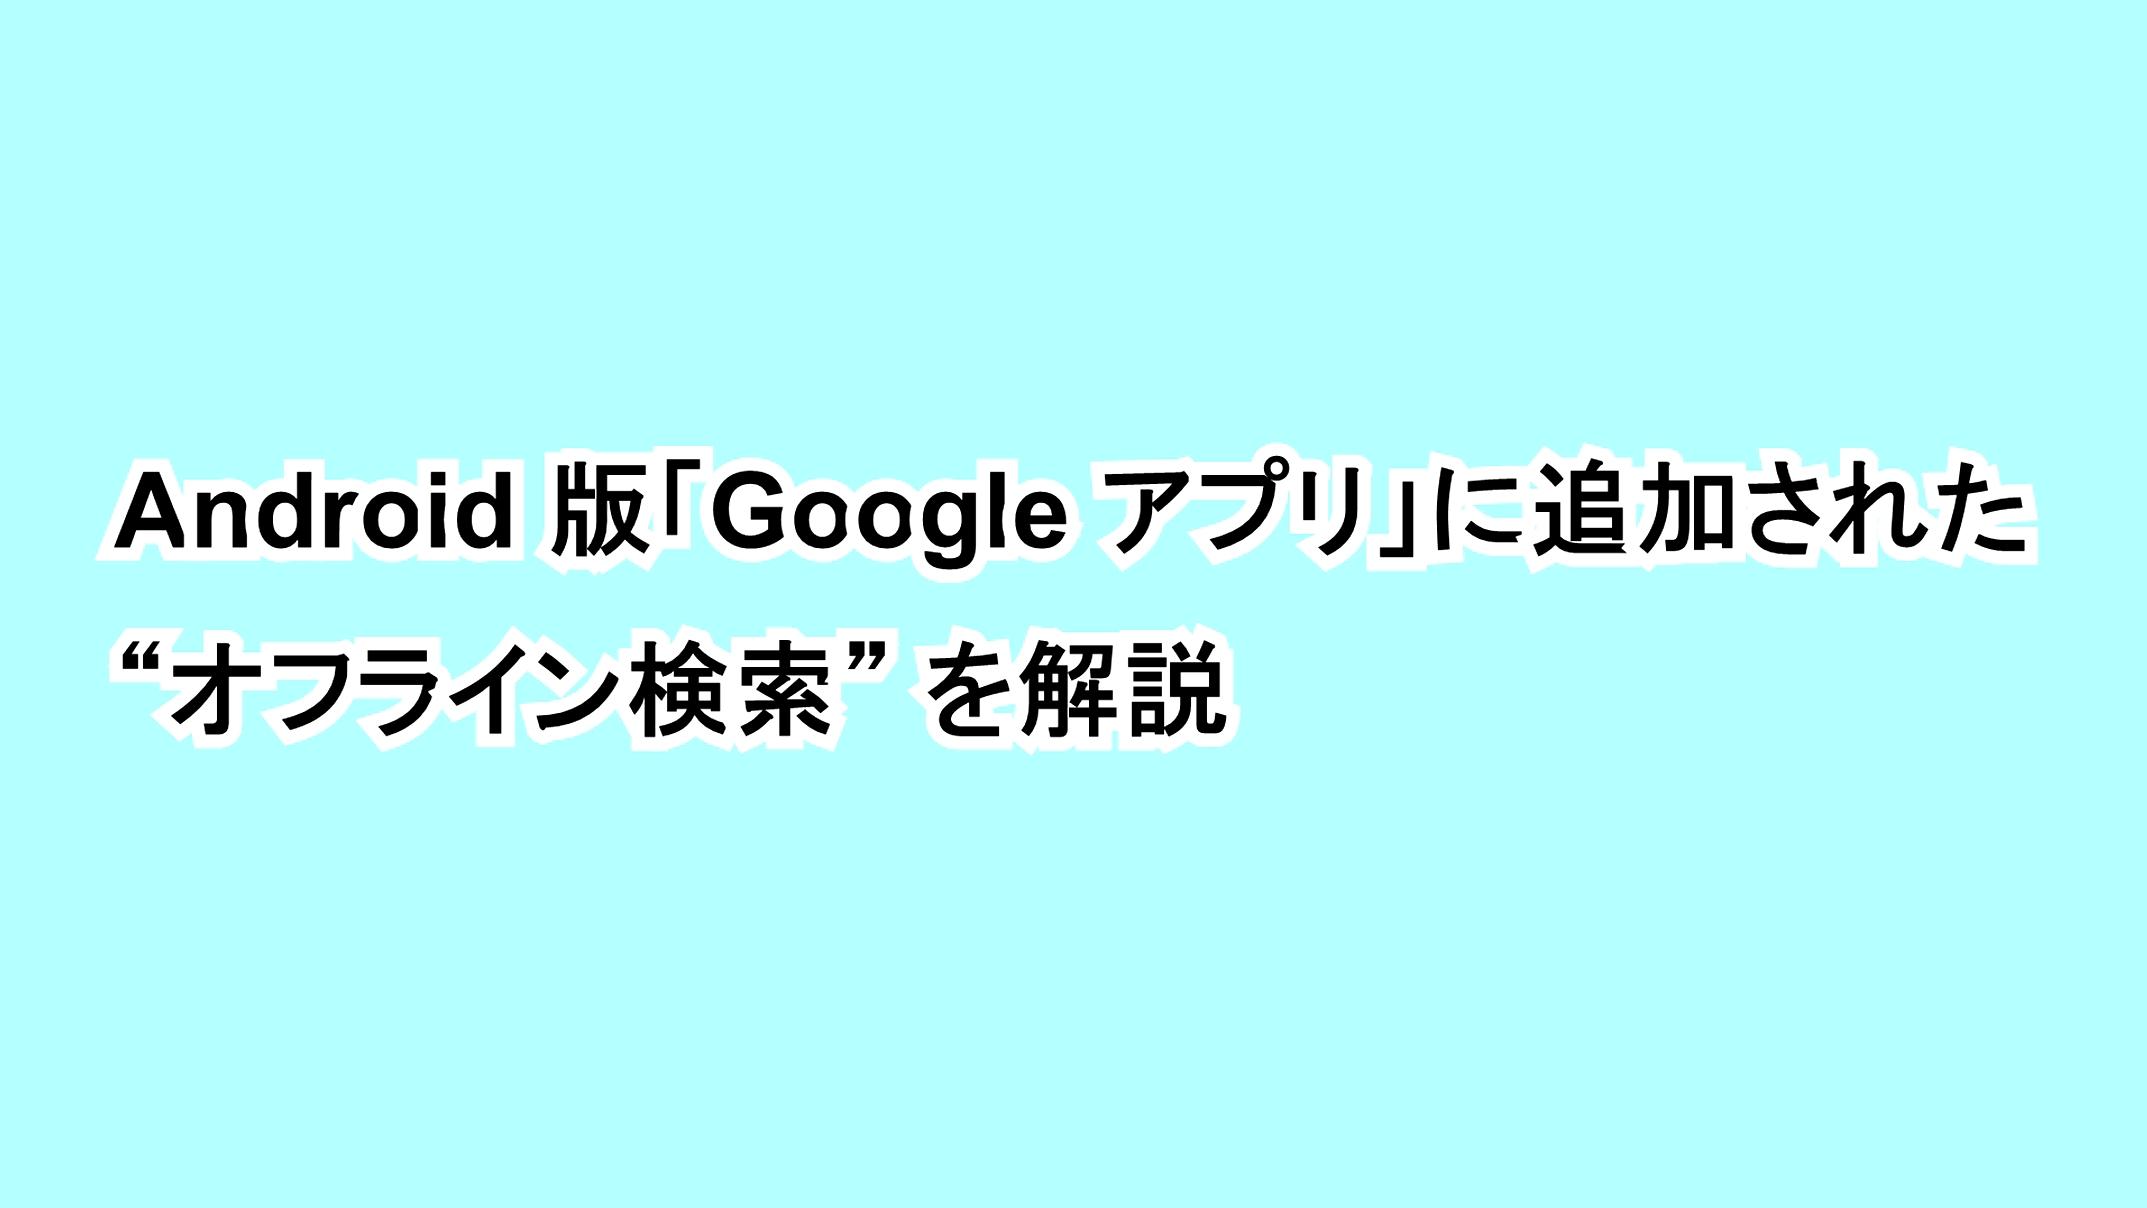 "Android版「Google アプリ」に追加された""オフライン検索""を解説"